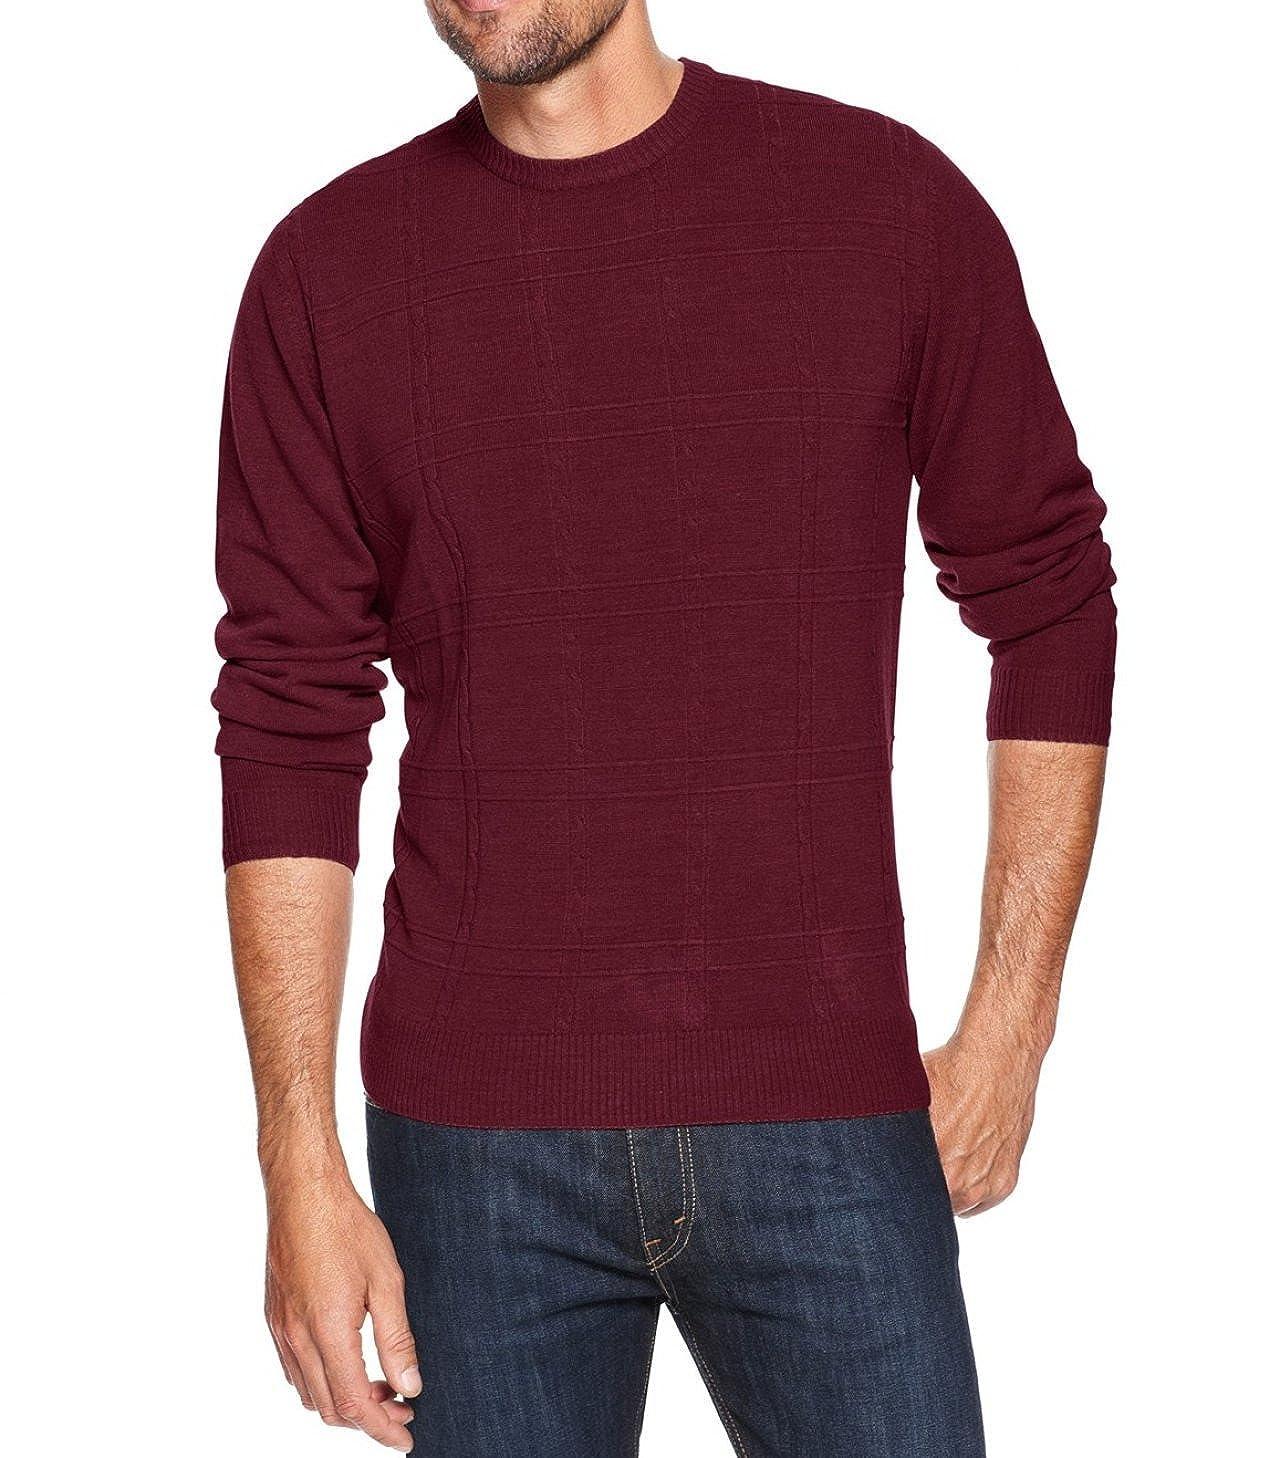 Tricots St Raphael Red Crewneck Sweater M